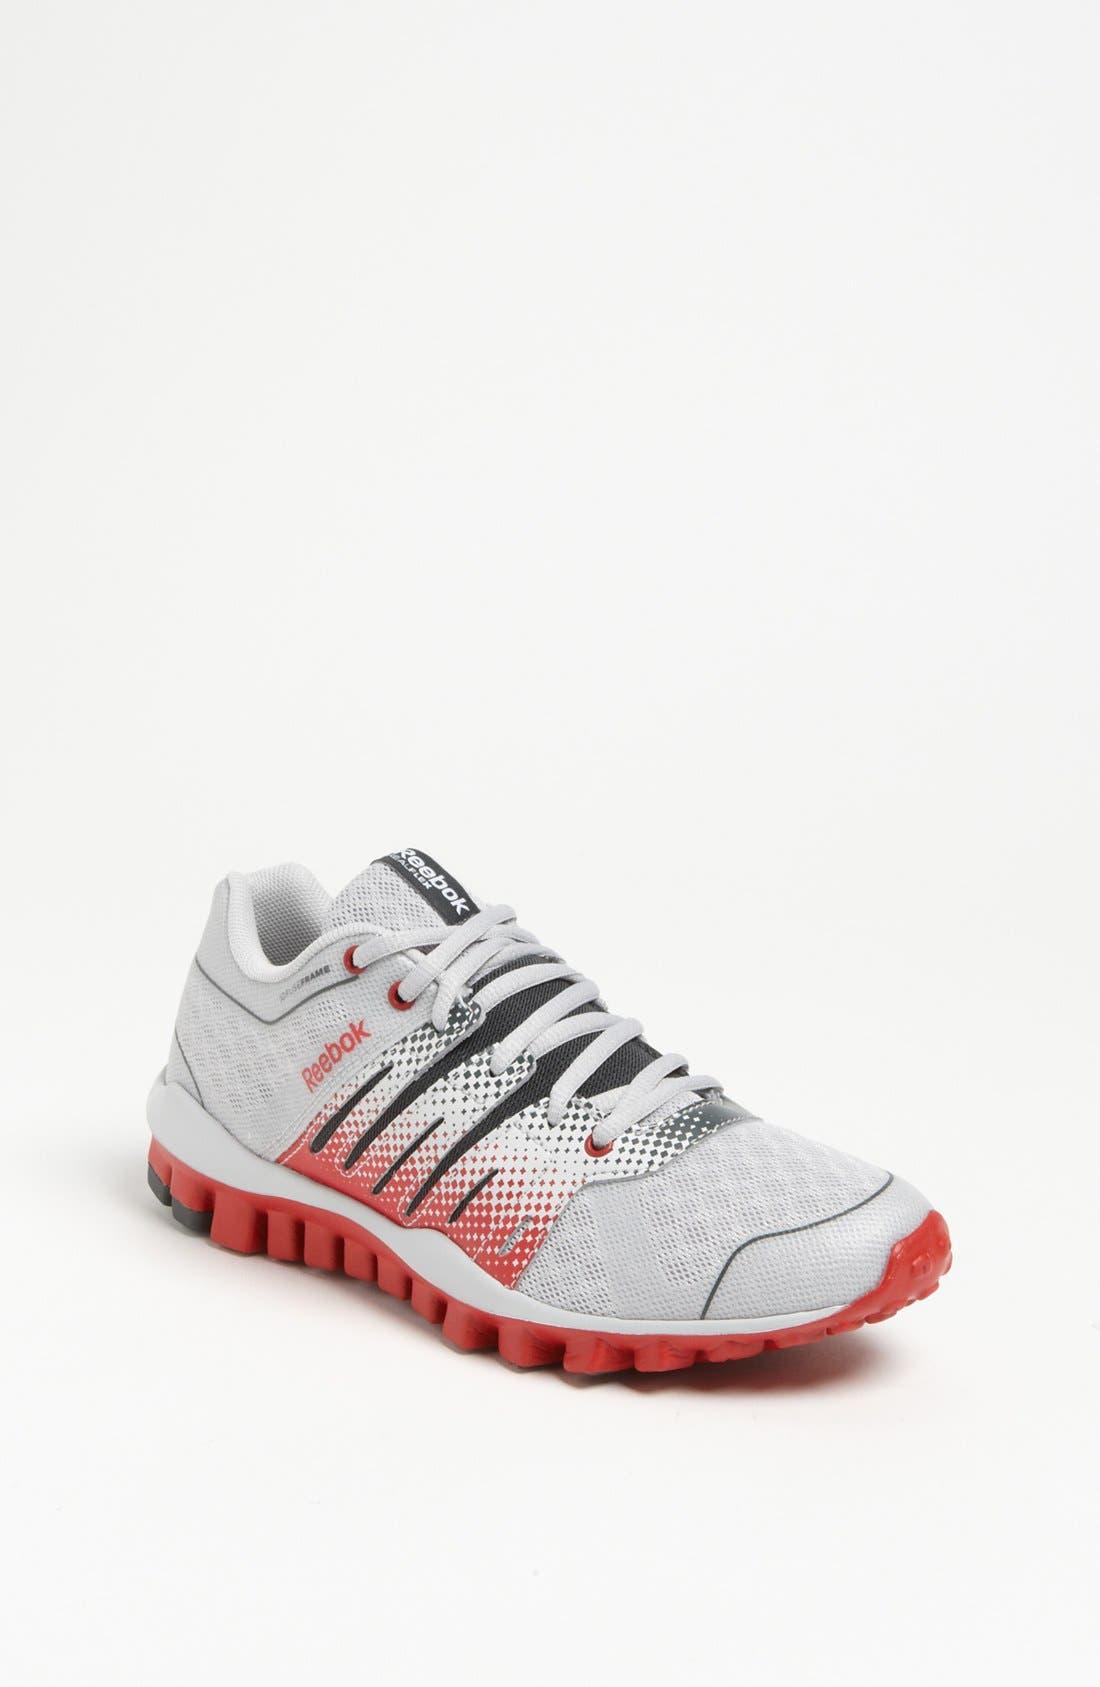 Main Image - Reebok 'RealFlex Strength' Training Sneaker (Big Kid)